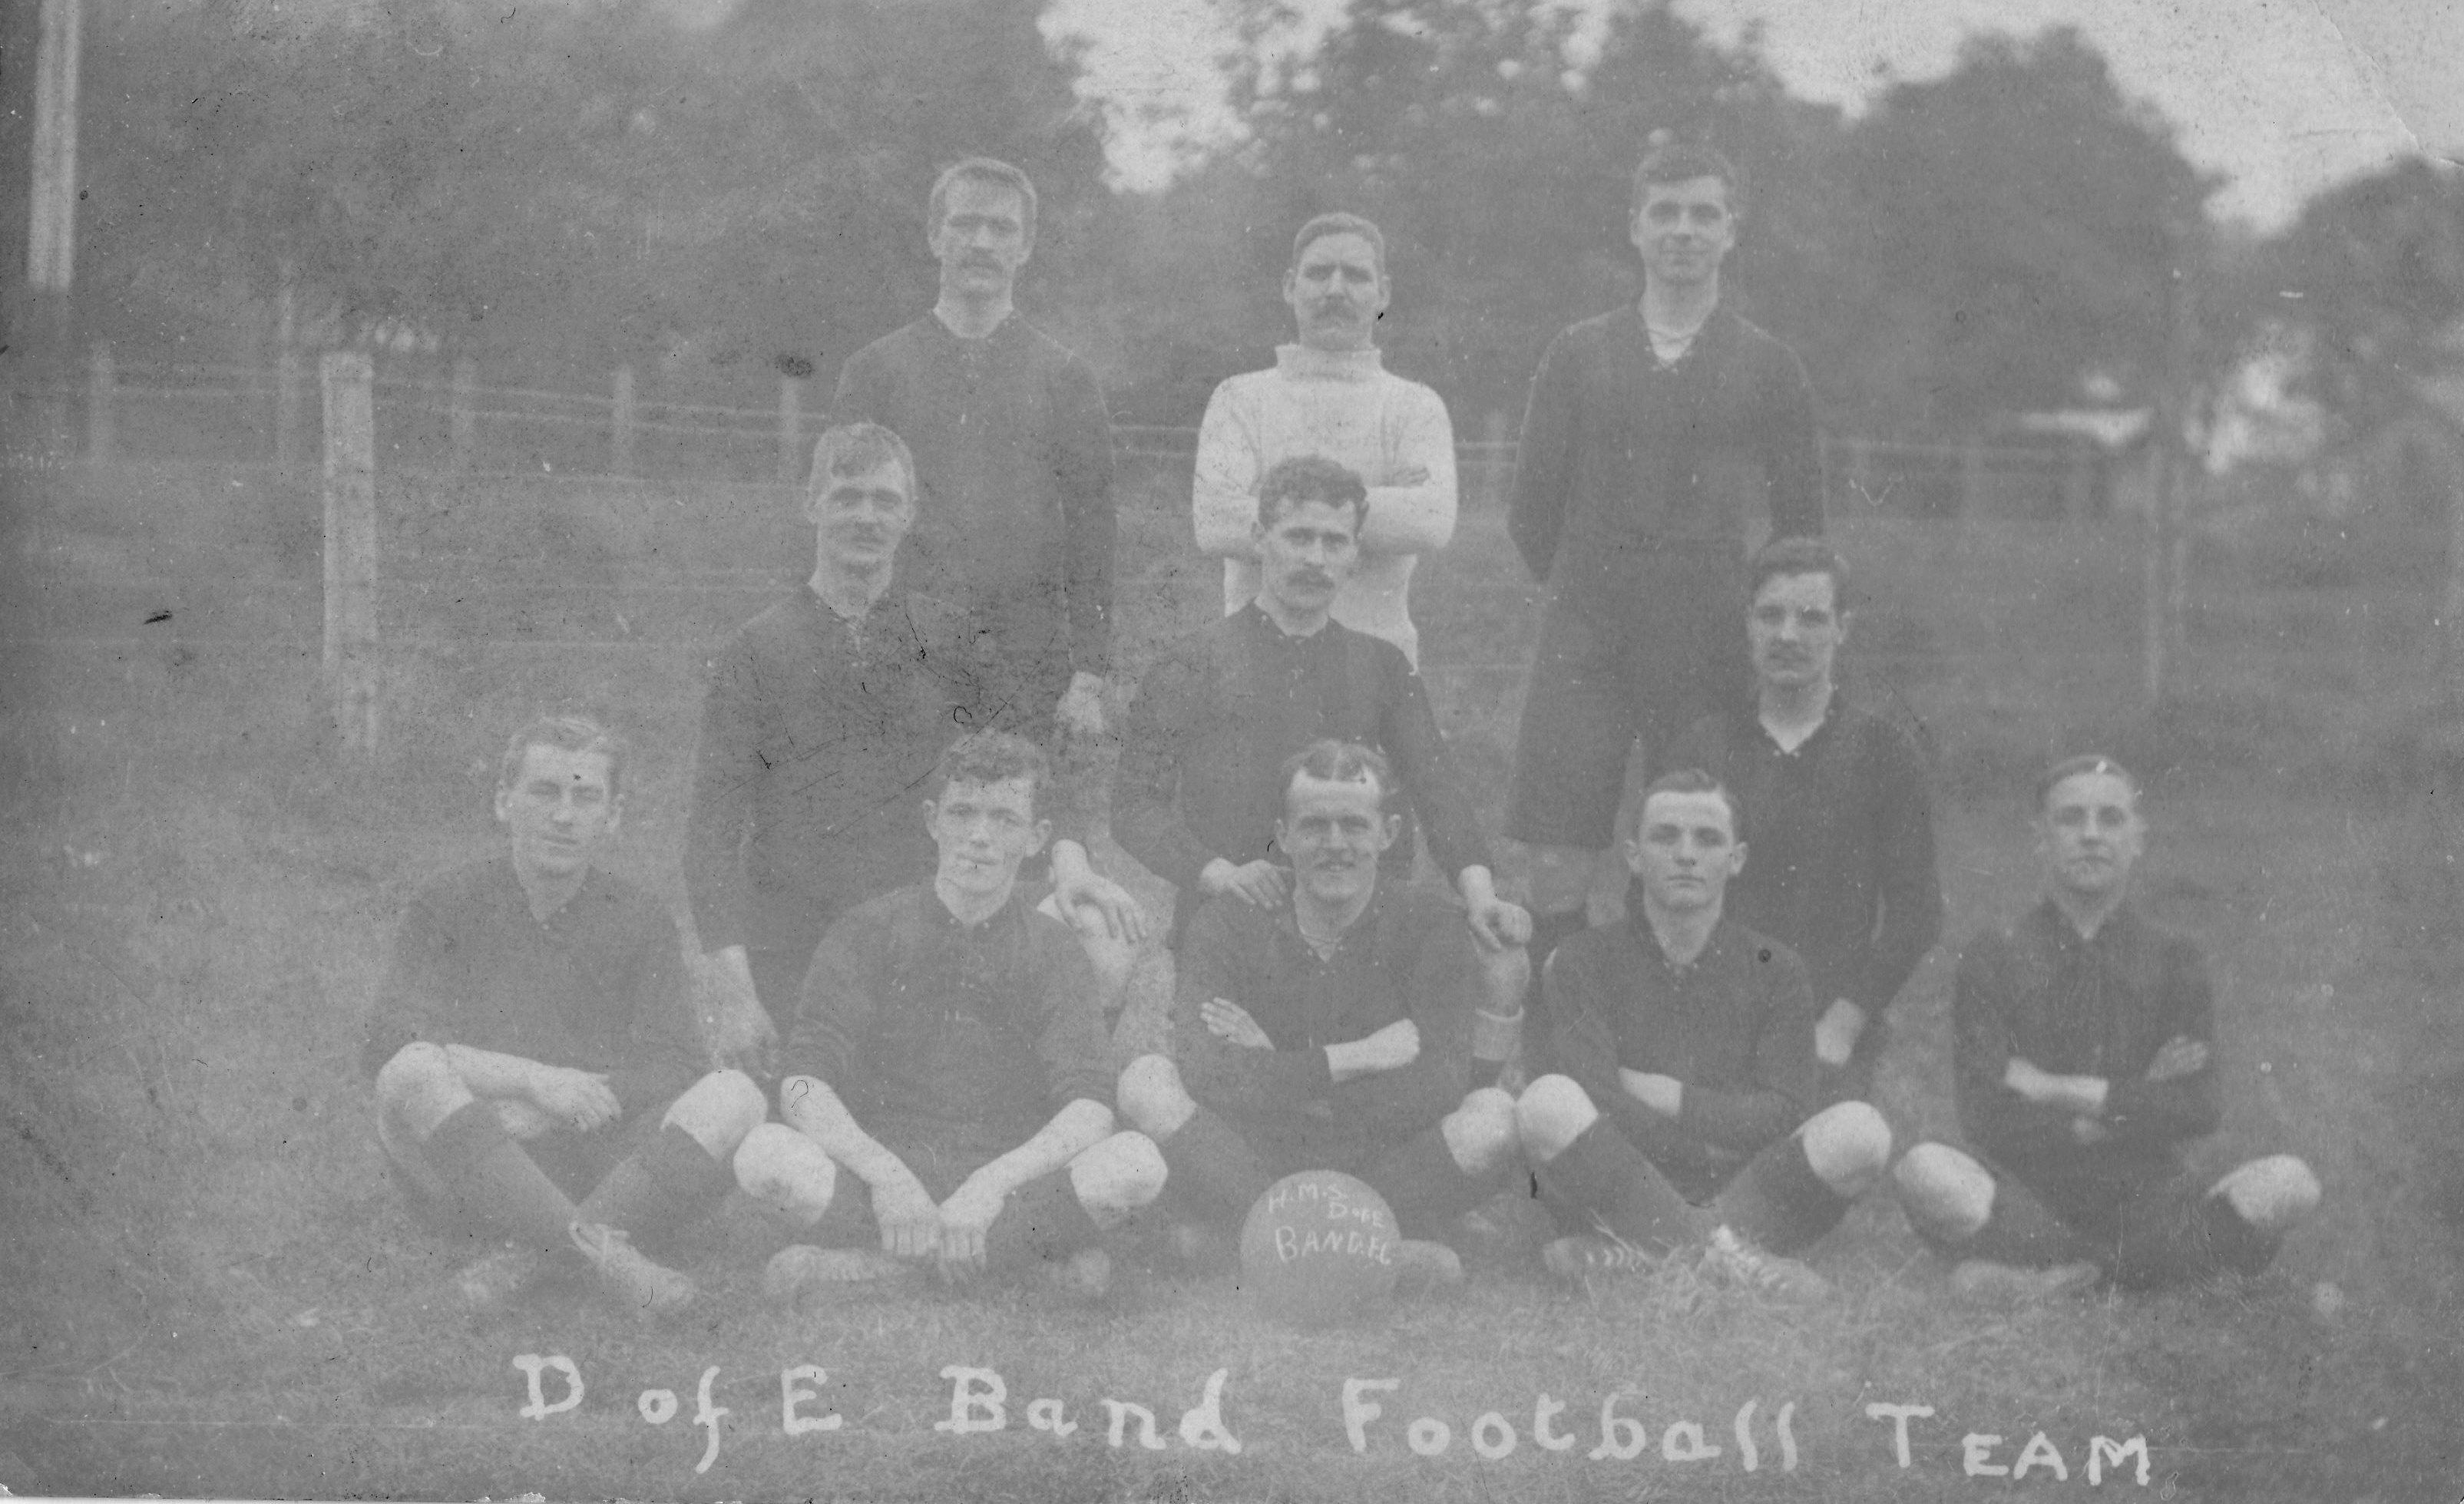 1910-12 H.M.S Duke of Edinburgh Band football team